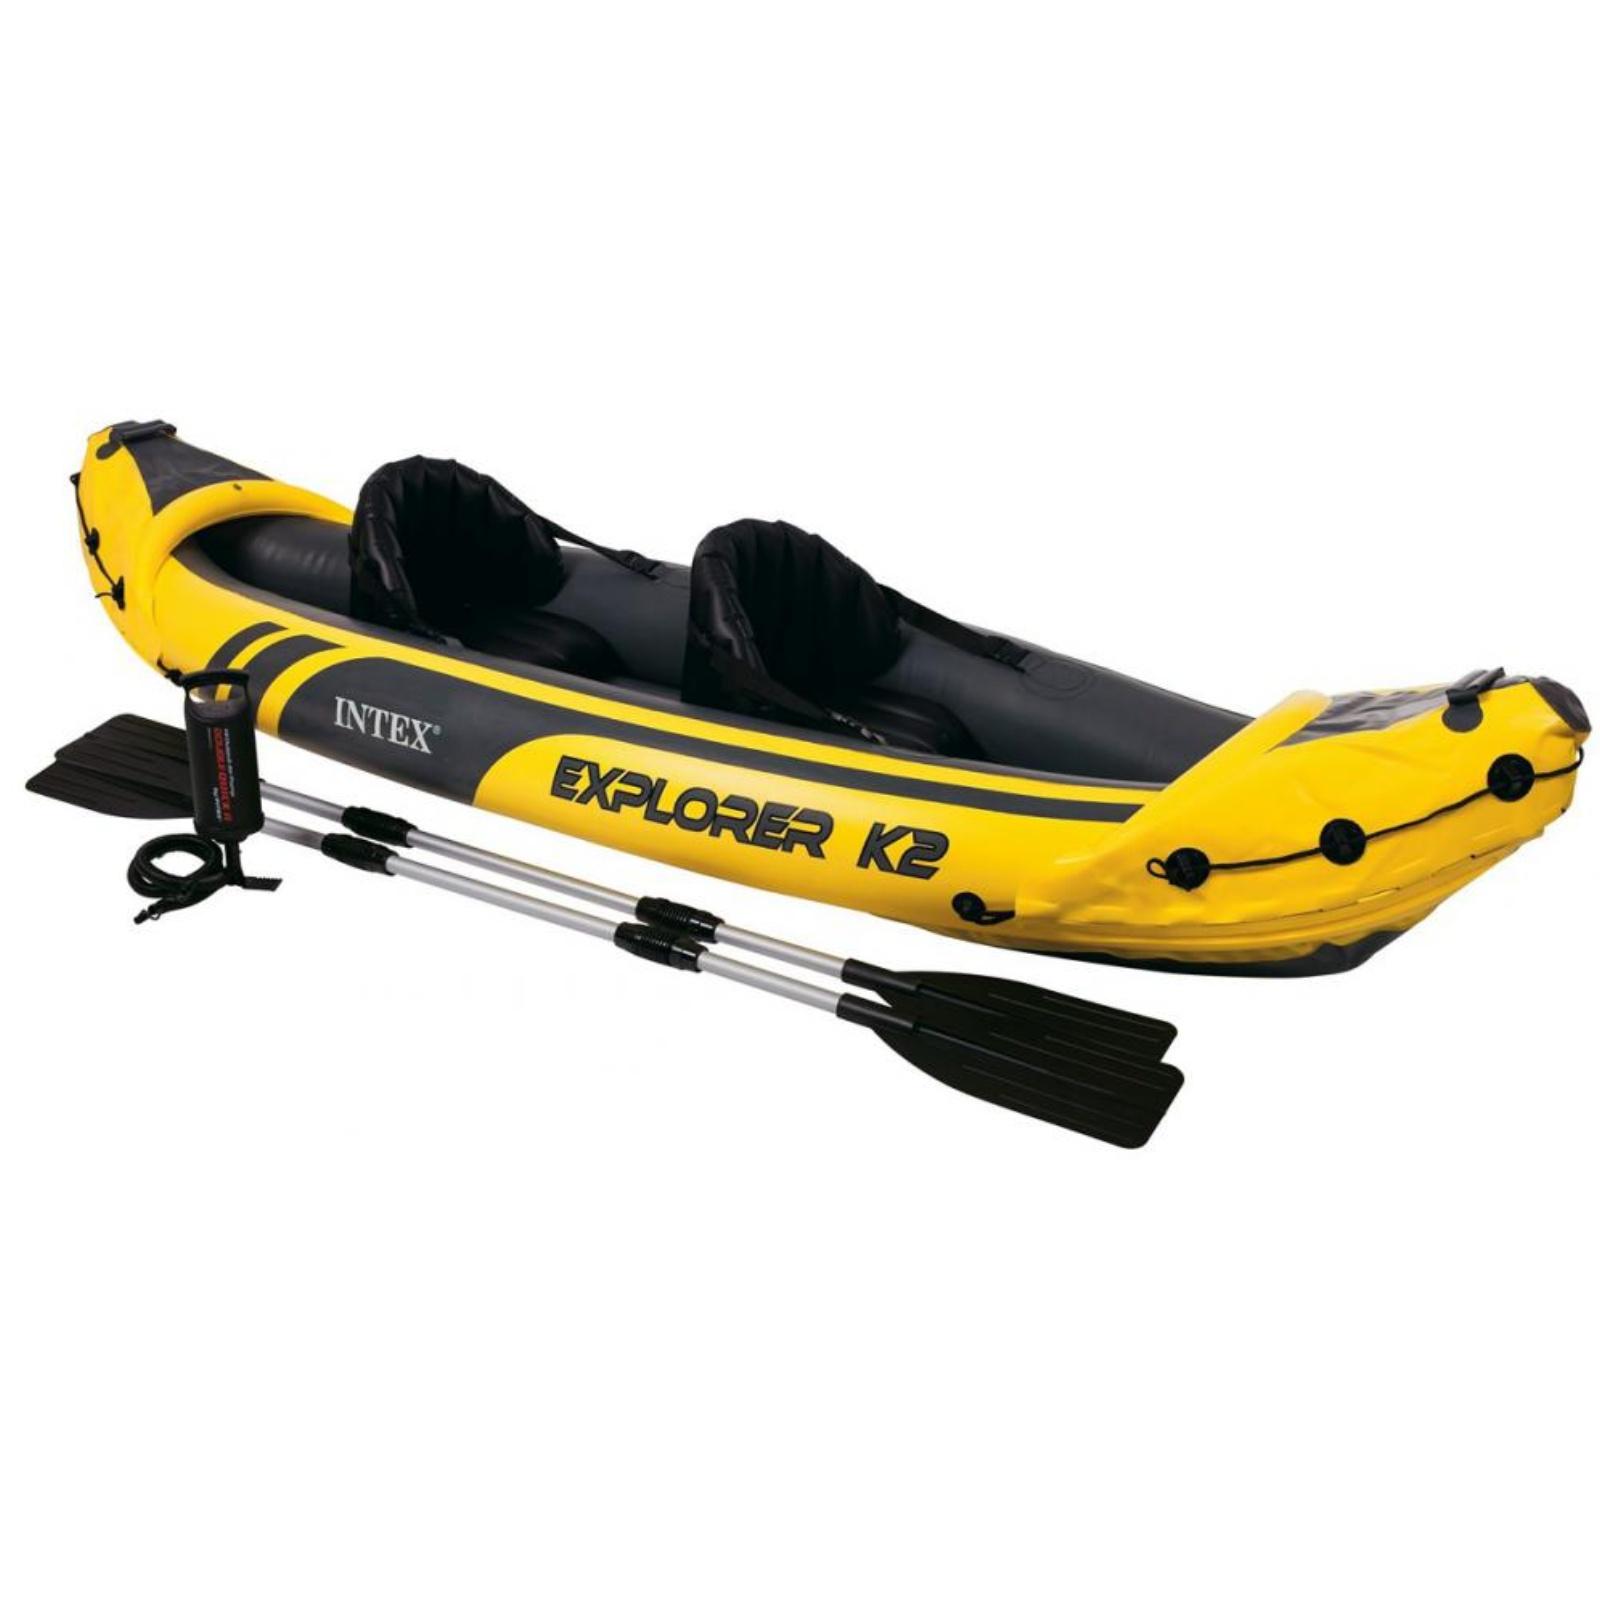 Nafukovací člun INTEX Explorer K2